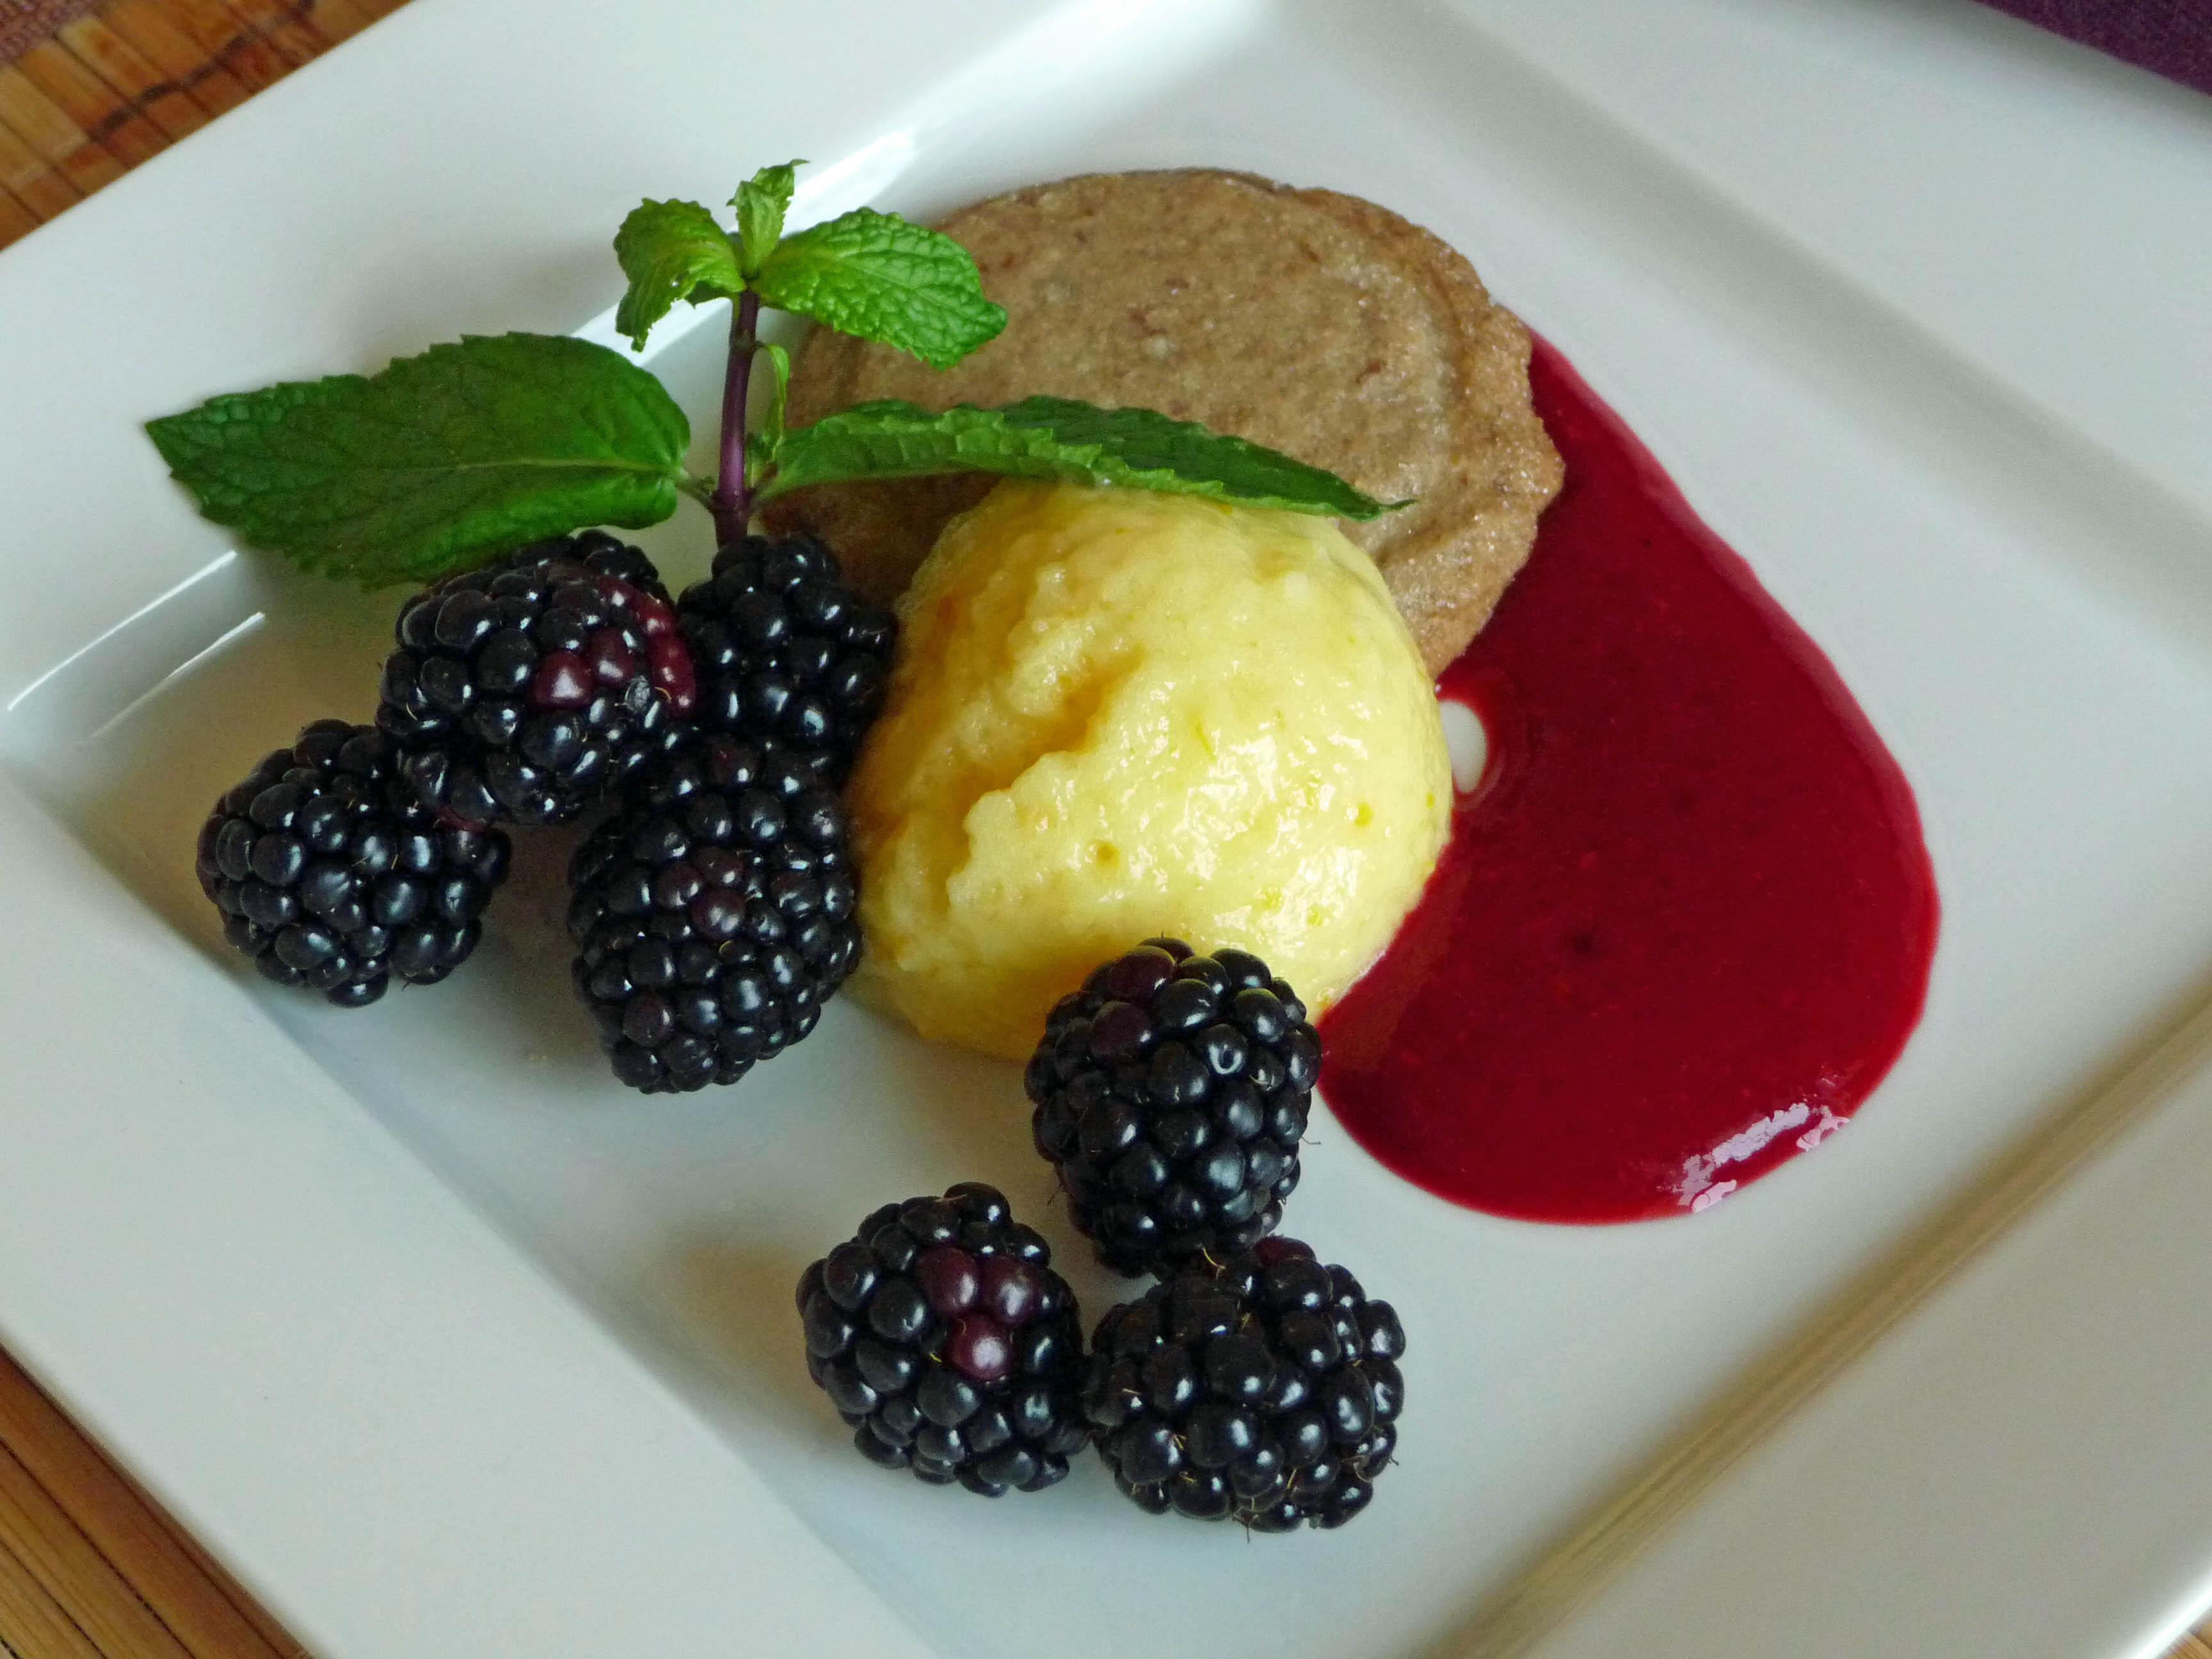 Meyer Lemon Curd, Maple Pecan Shortbread, Coulis, Blackberries (c) jfhaugen